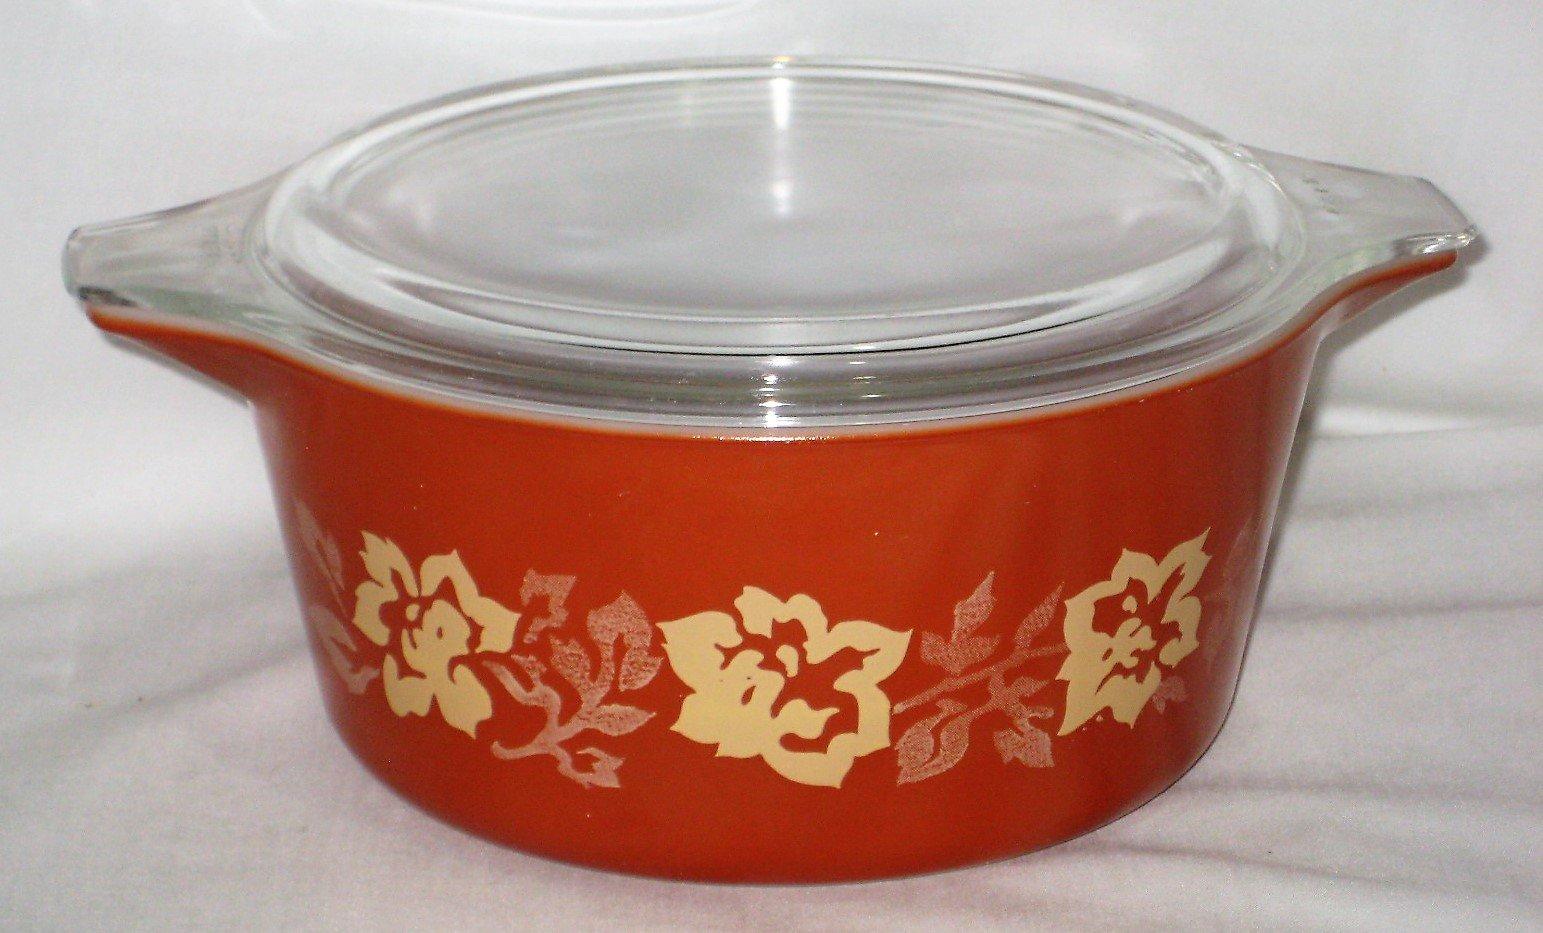 Vintage Pyrex Terra Cotta Rose 1 1/2 Lite Round Glass Casserole w/ Clear Glass Lid